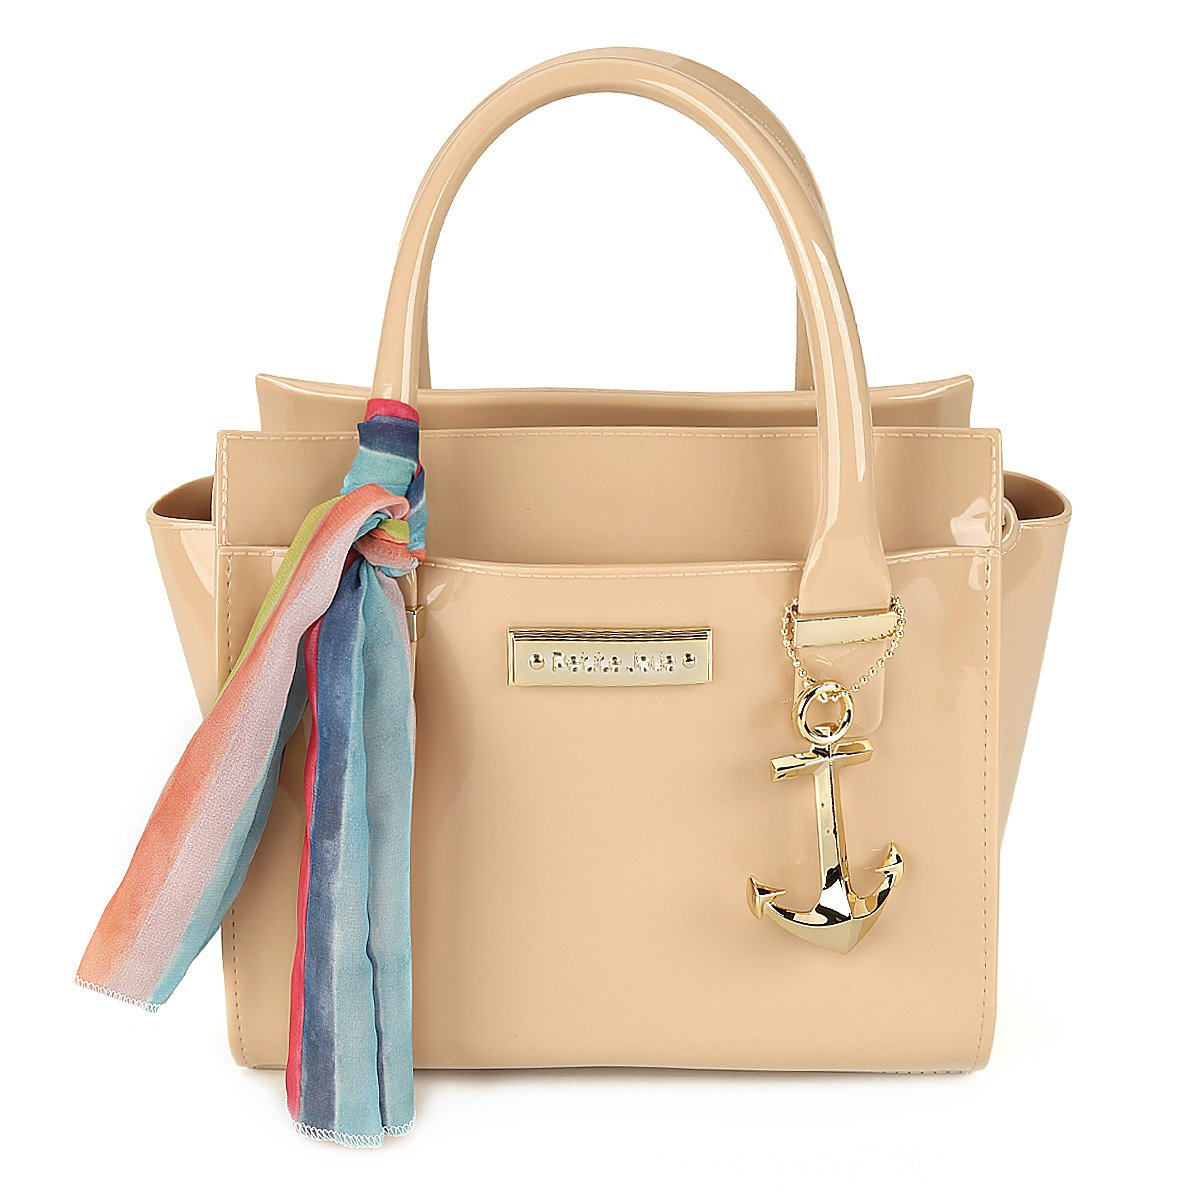 bab86a3306 Bolsa Petit Jolie Mini Bag Love Feminina - Compre Agora